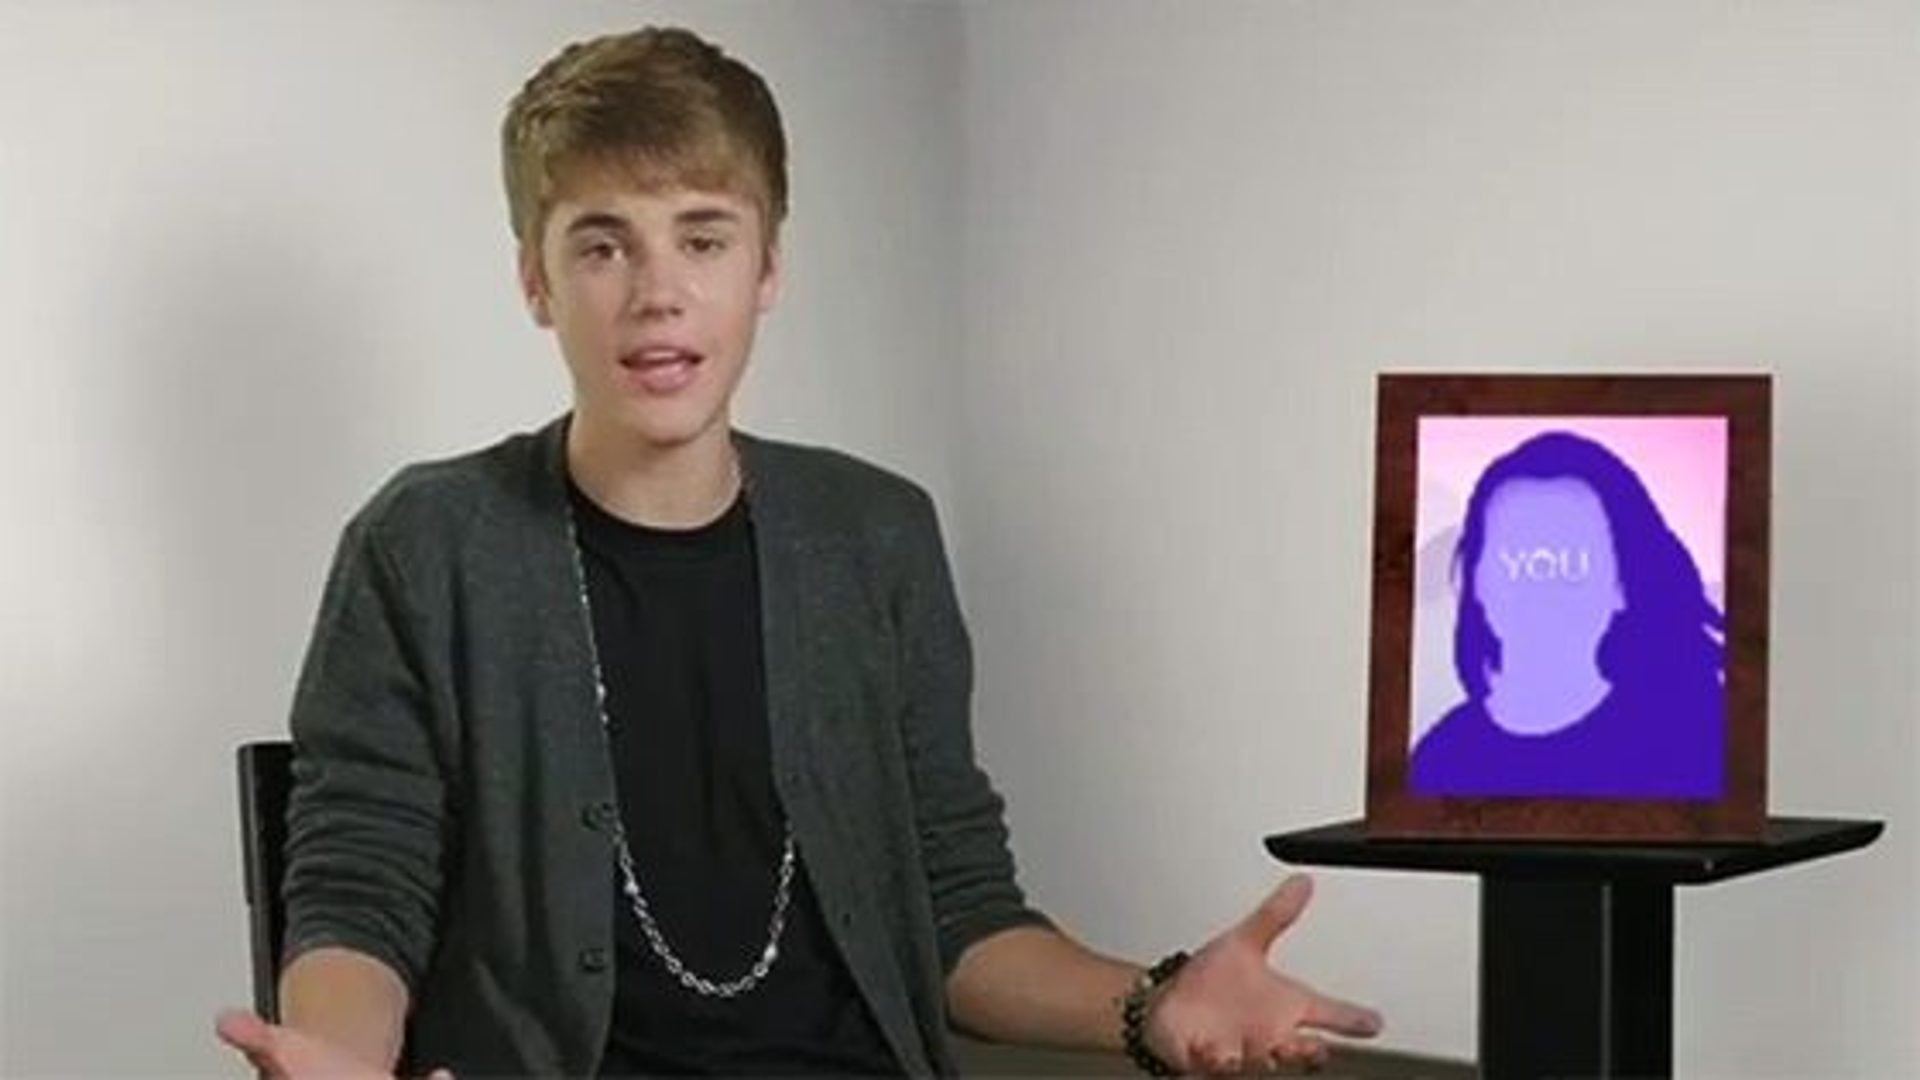 Justin-Bieber-Someday-Dads